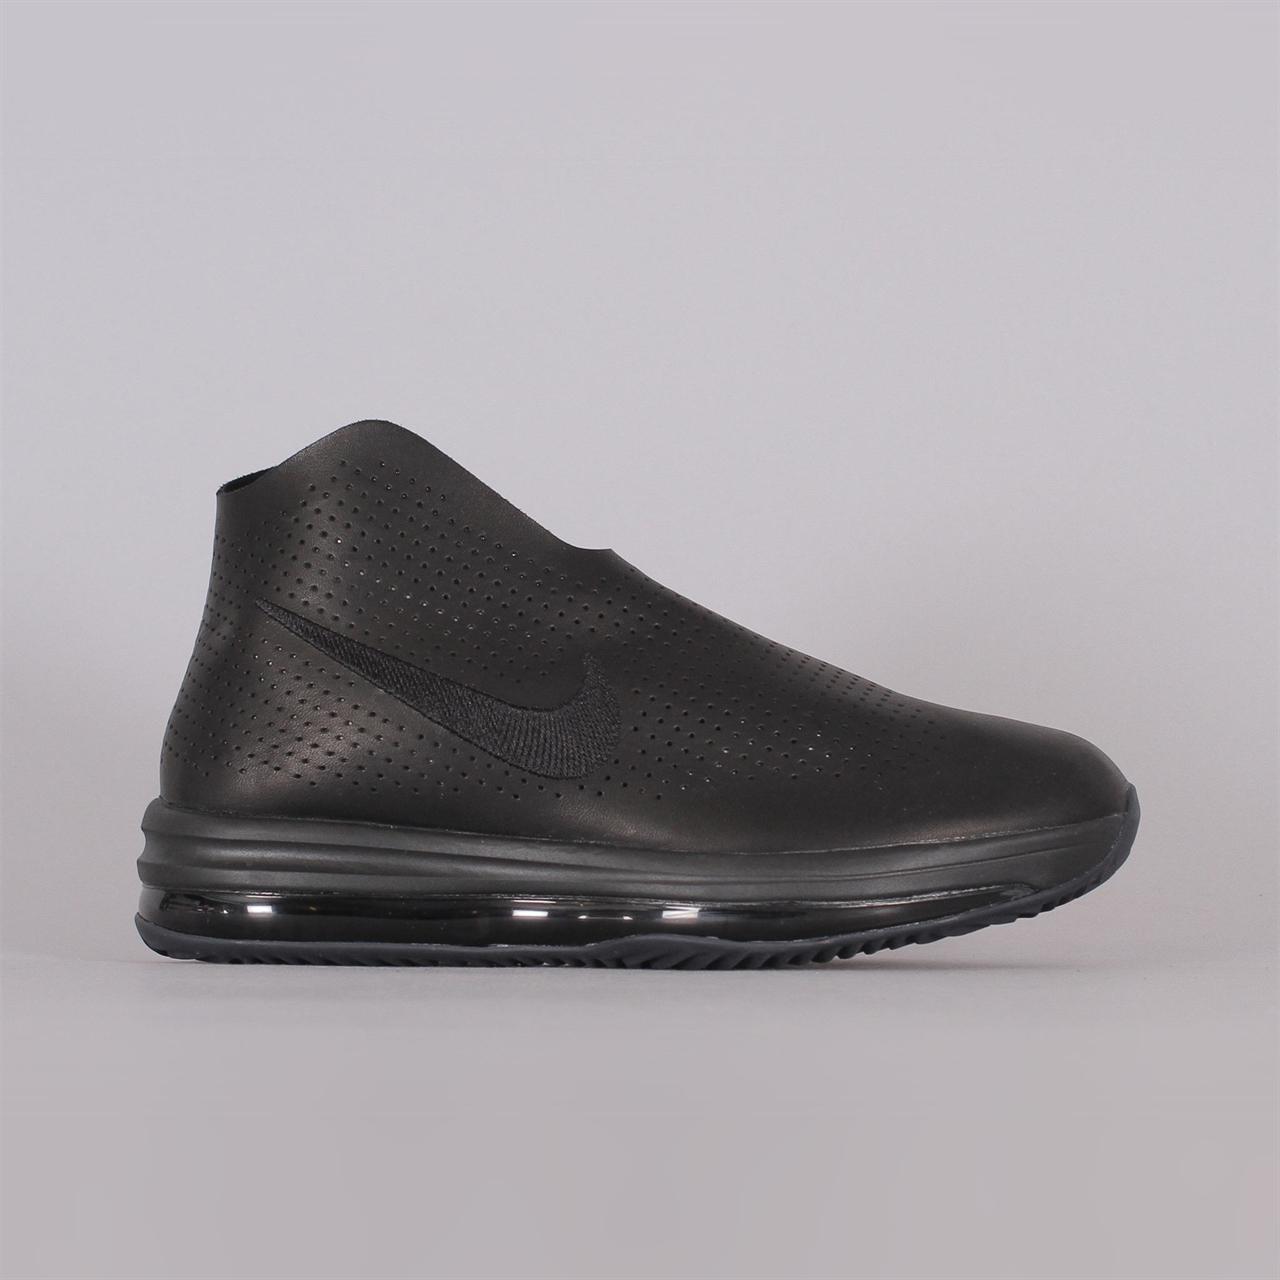 11c97072dbe1d Shelta - Nike Sportswear Womens Zoom Modairna (880884-001)